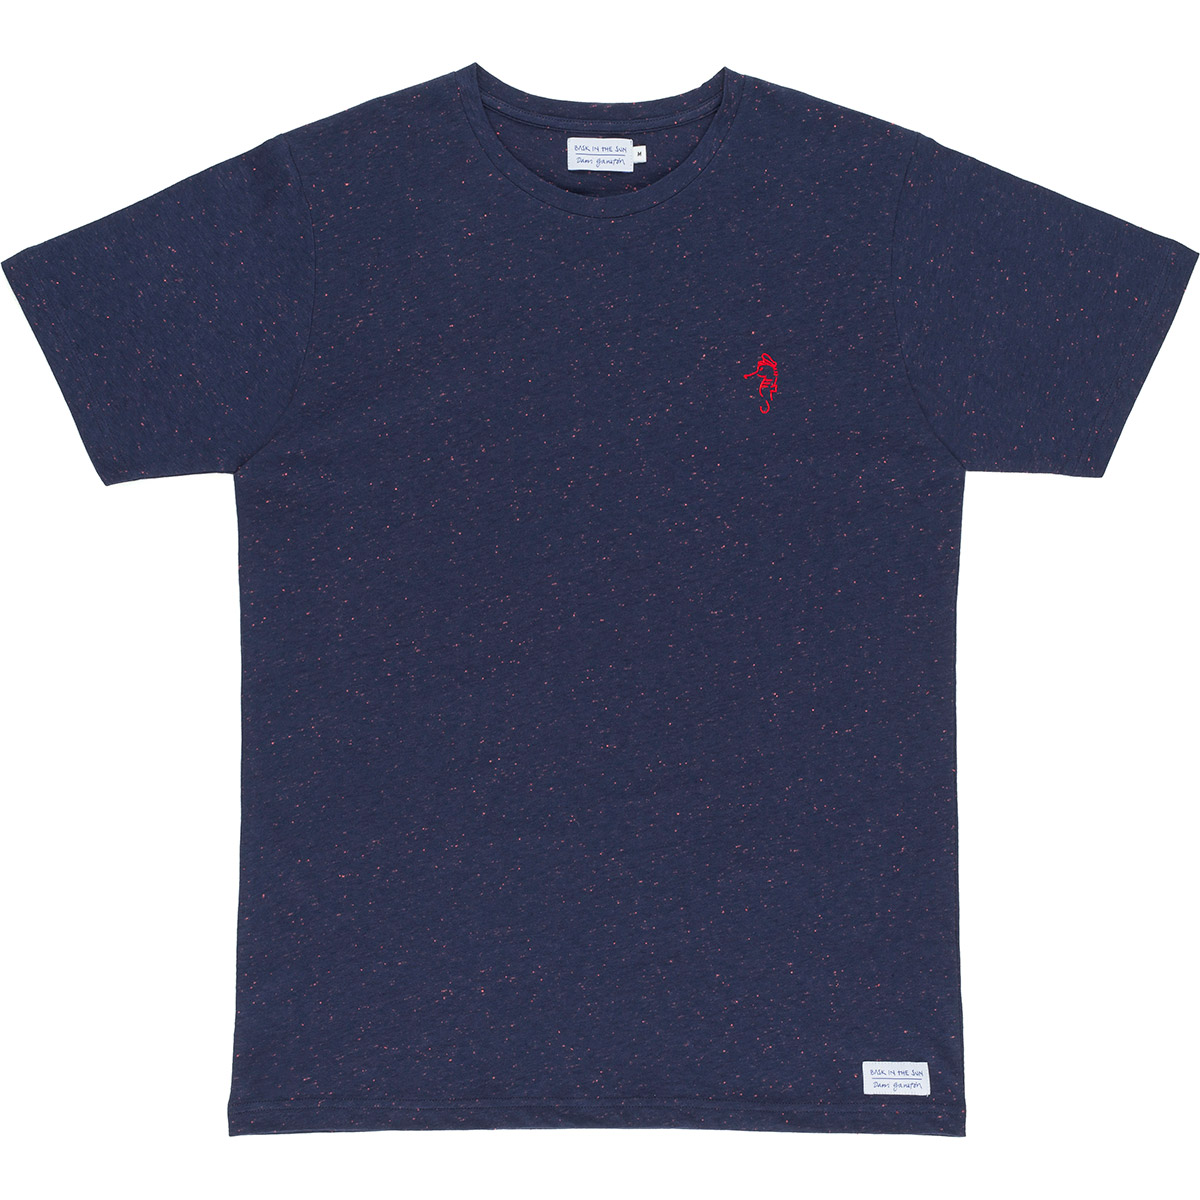 Bask in the Sun - T-shirt en coton bio blue captain seahorse